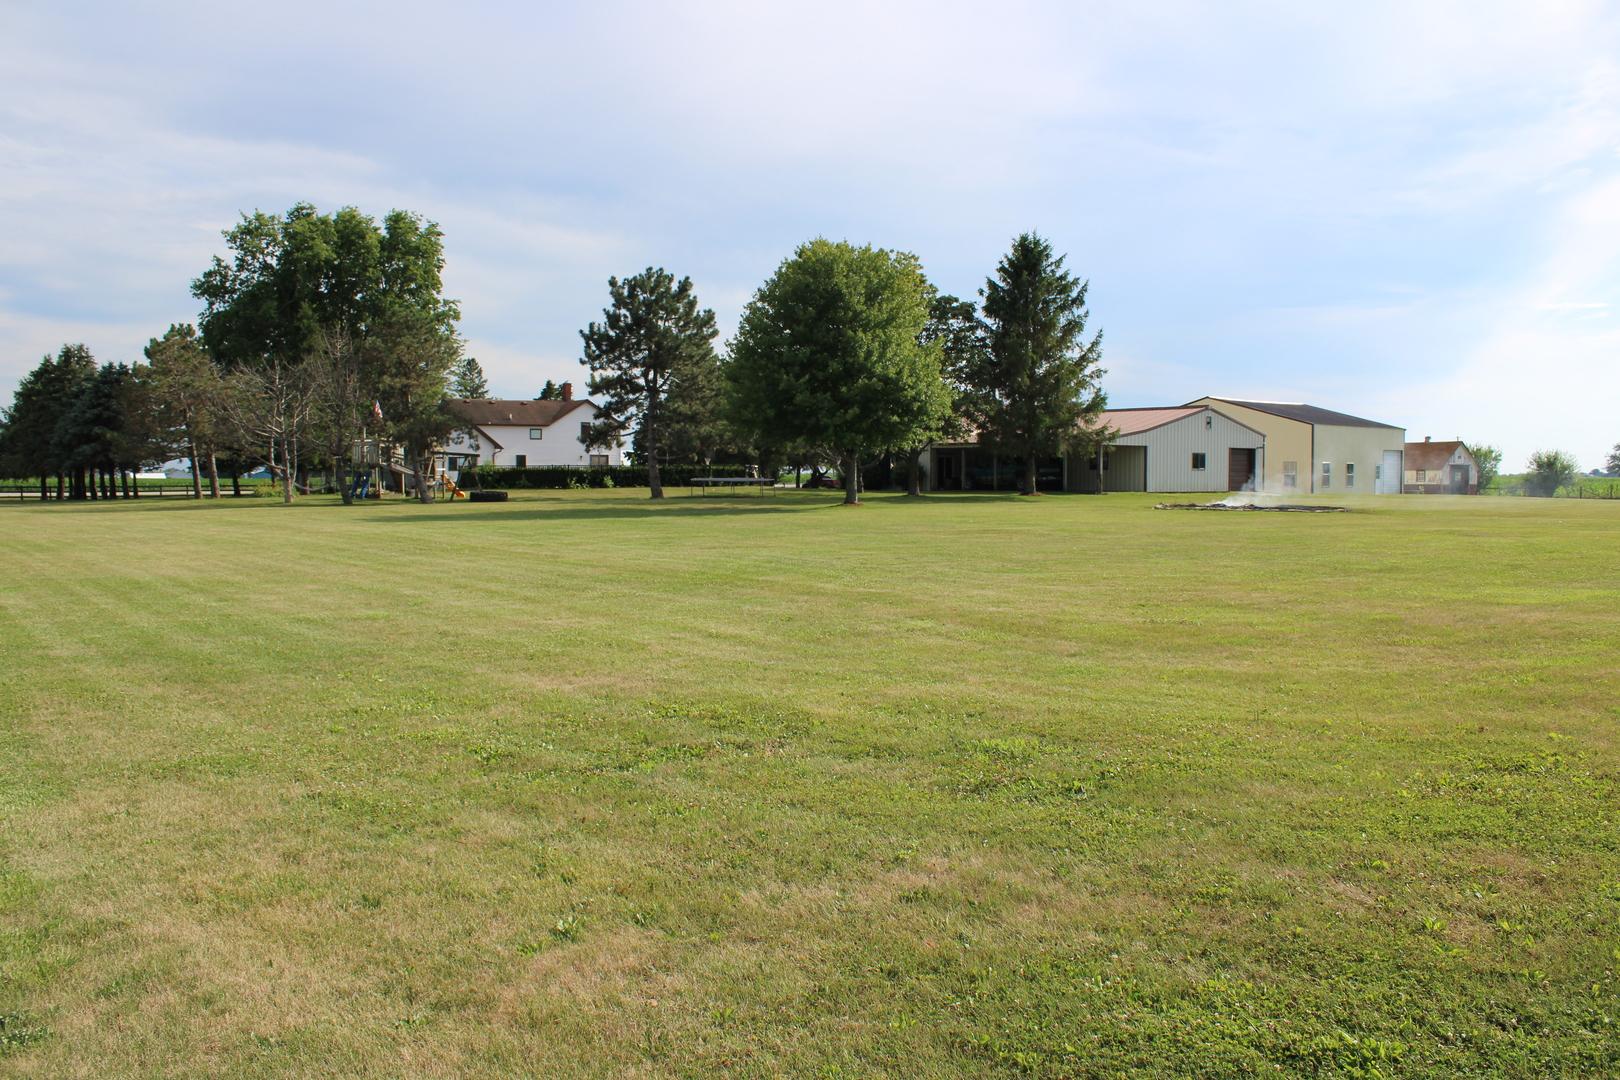 1809 East Il. State Route 34, Leland, Illinois, 60531